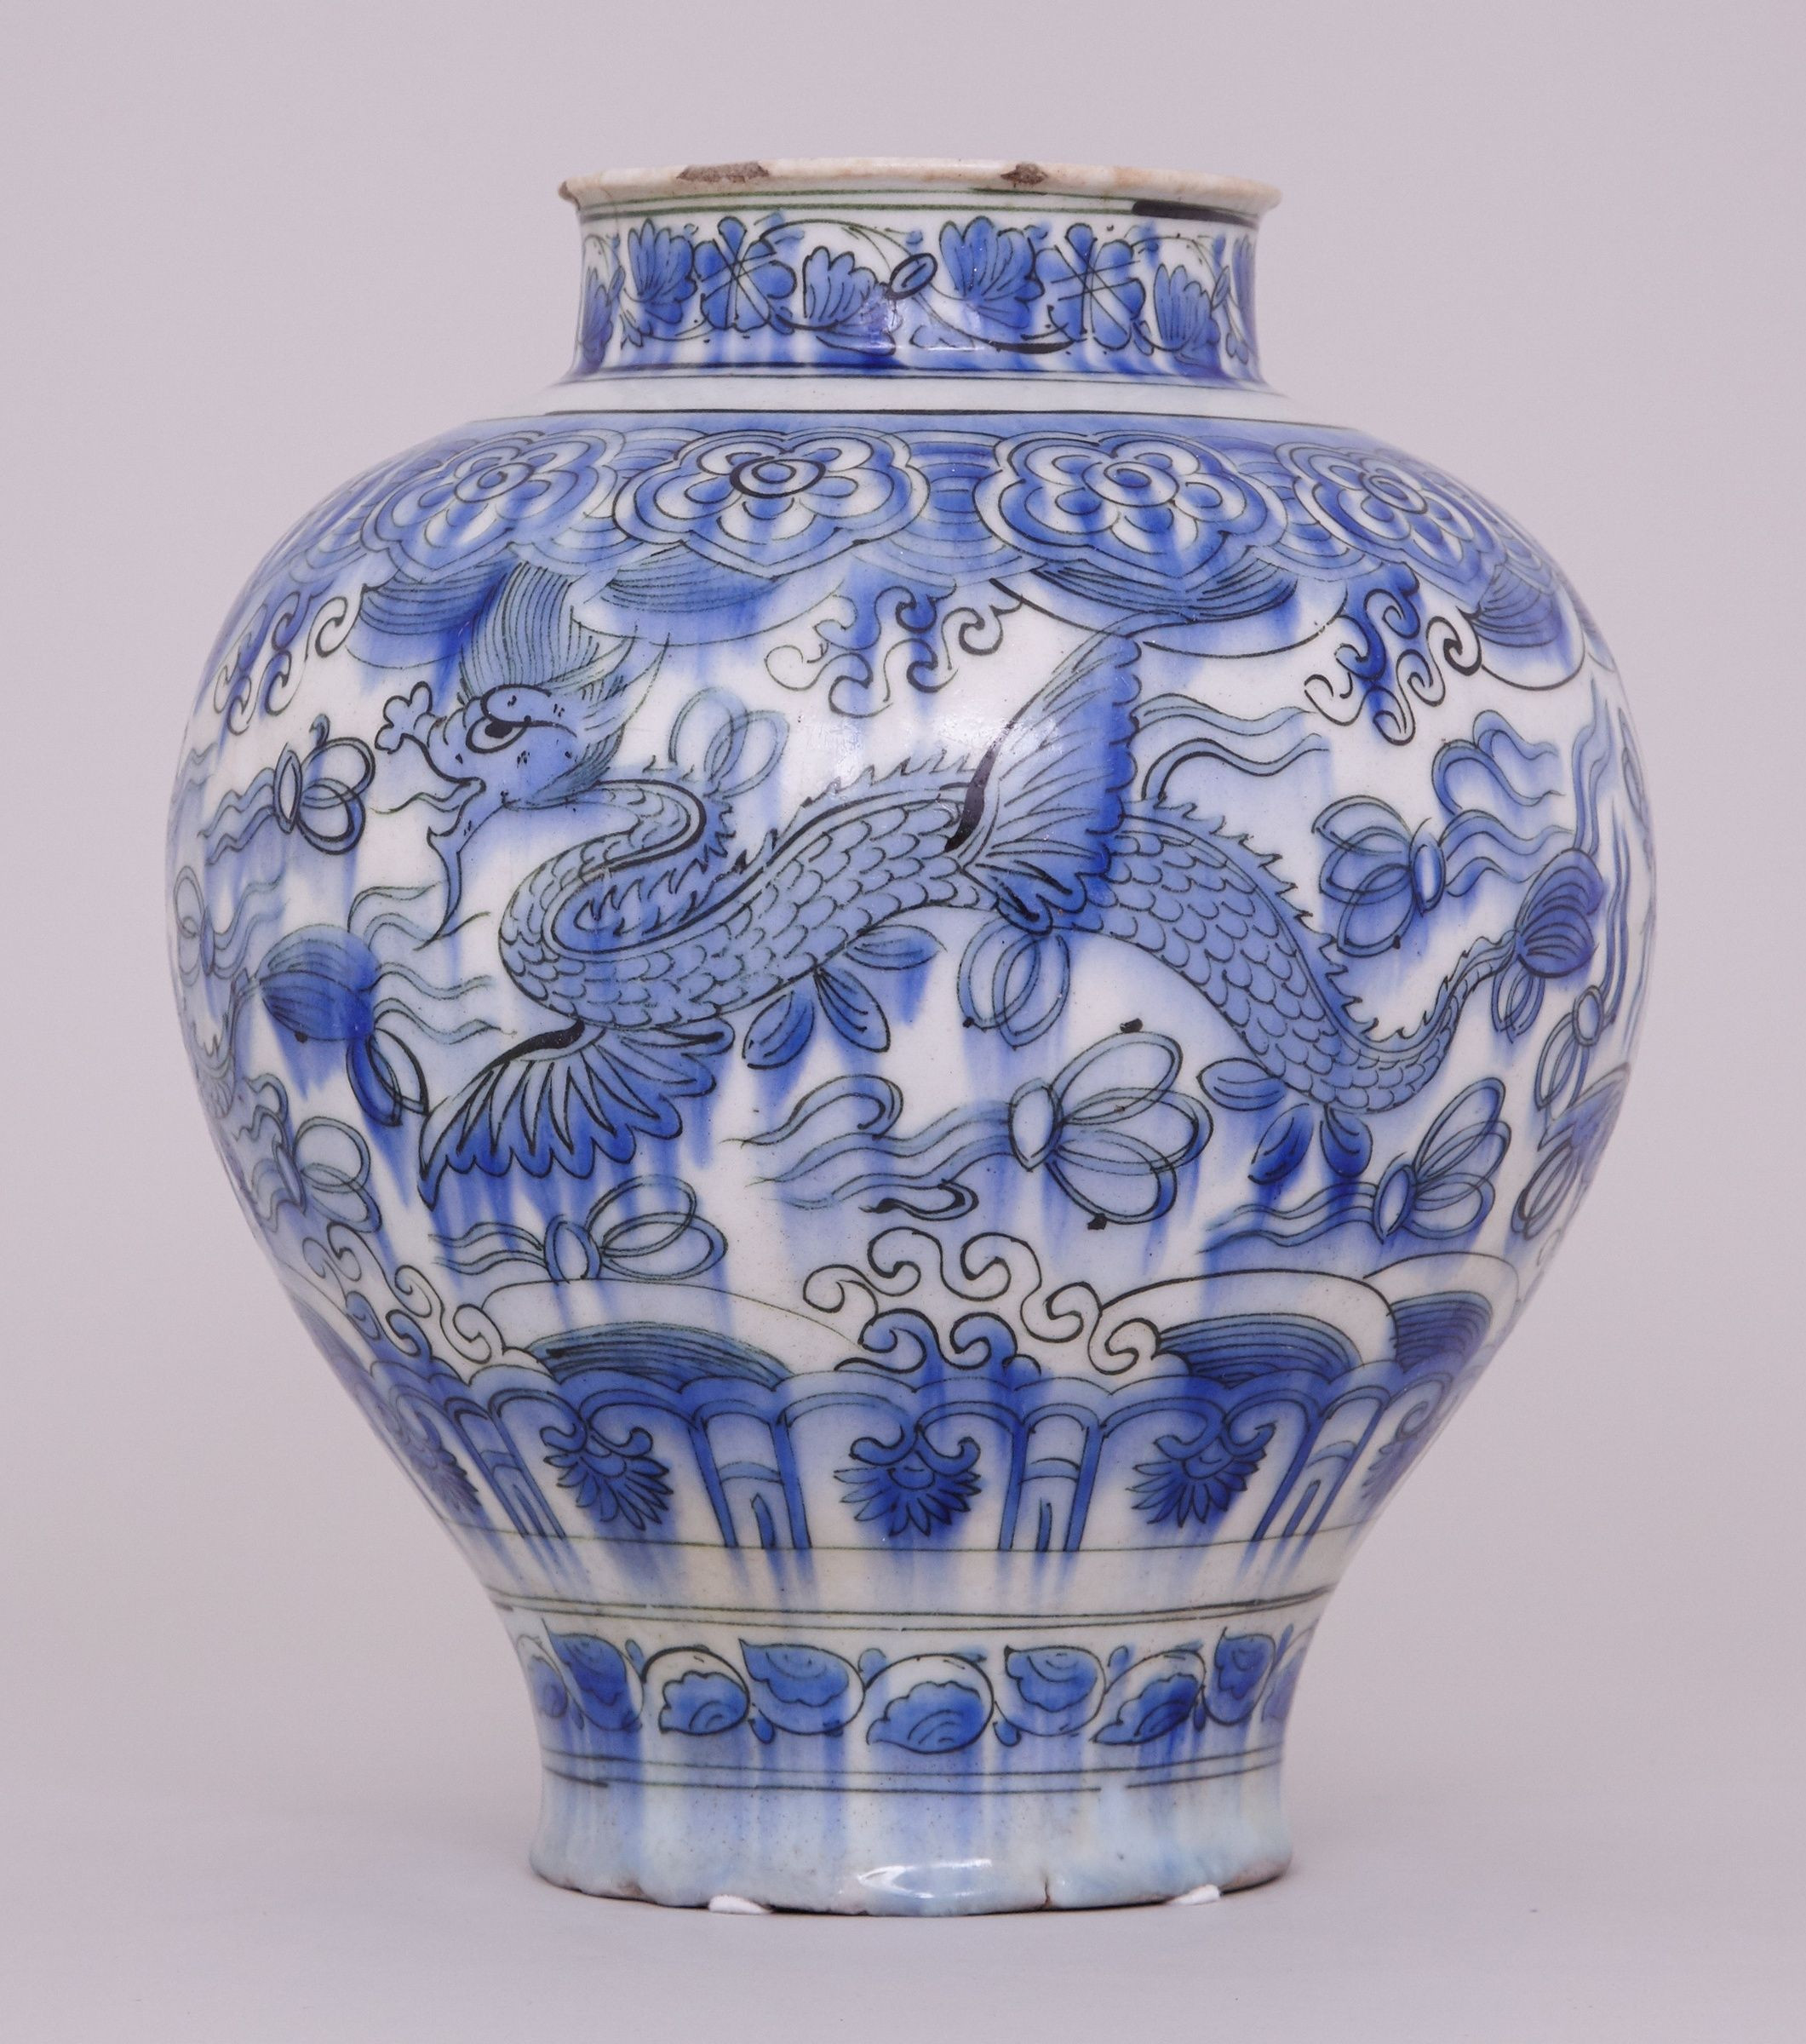 hull art vase of white pottery vase elegant a blue and white persian safavid jar 17th pertaining to white pottery vase elegant a blue and white persian safavid jar 17th century